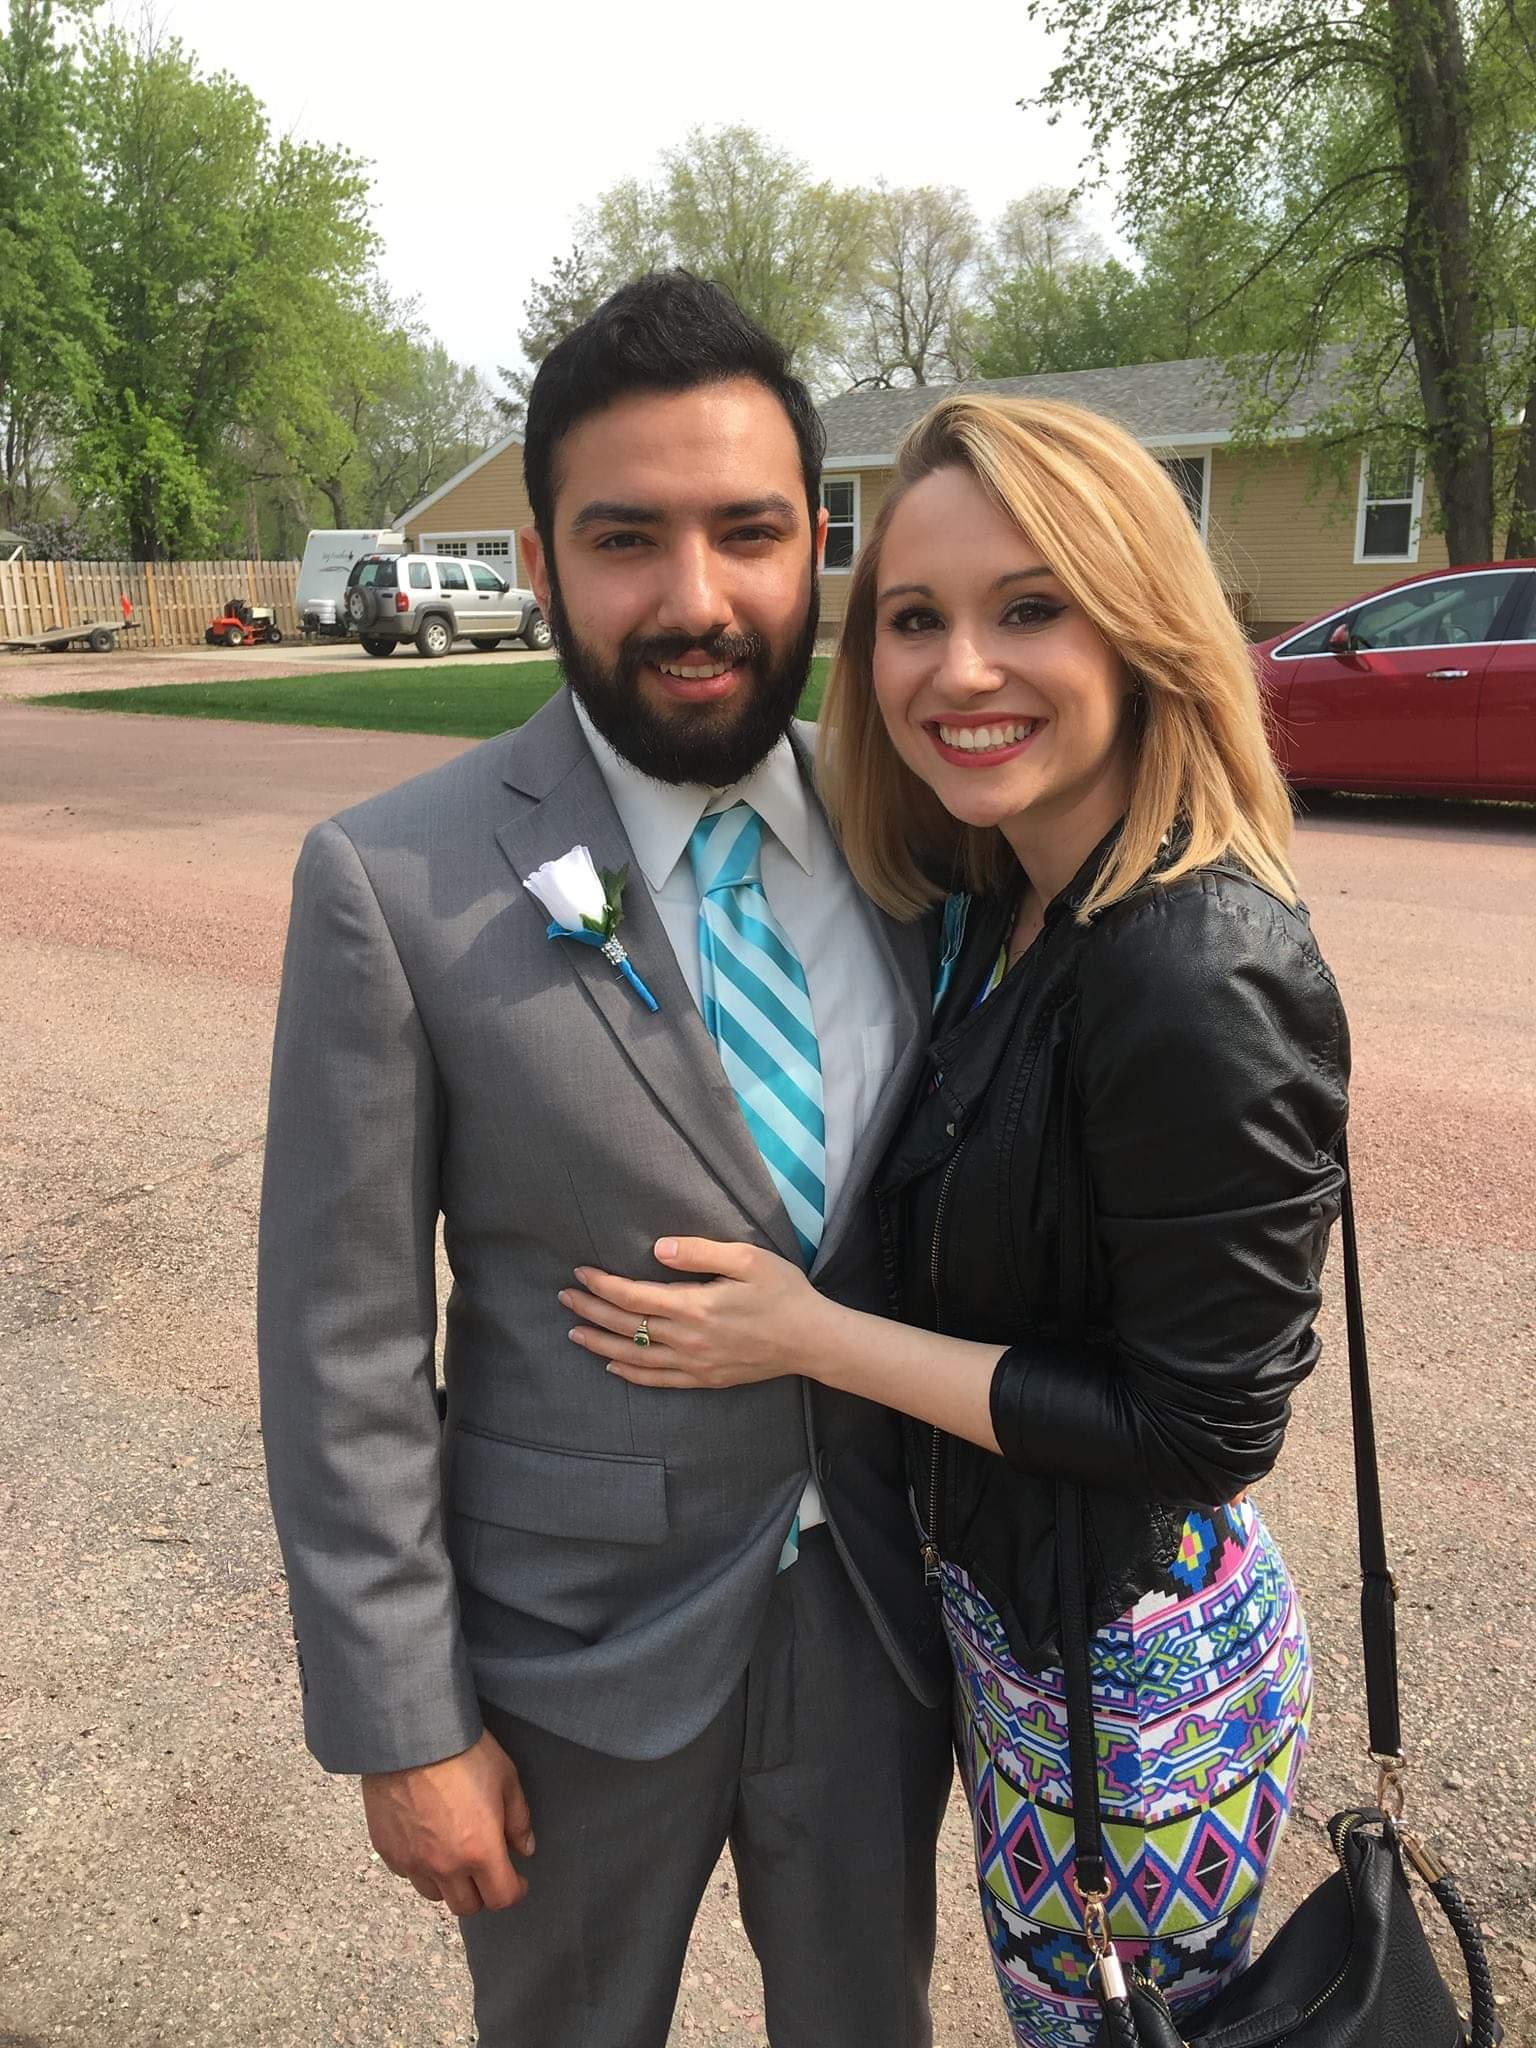 Juan Suarez and Megan Reimnitz in Mitchell, SD